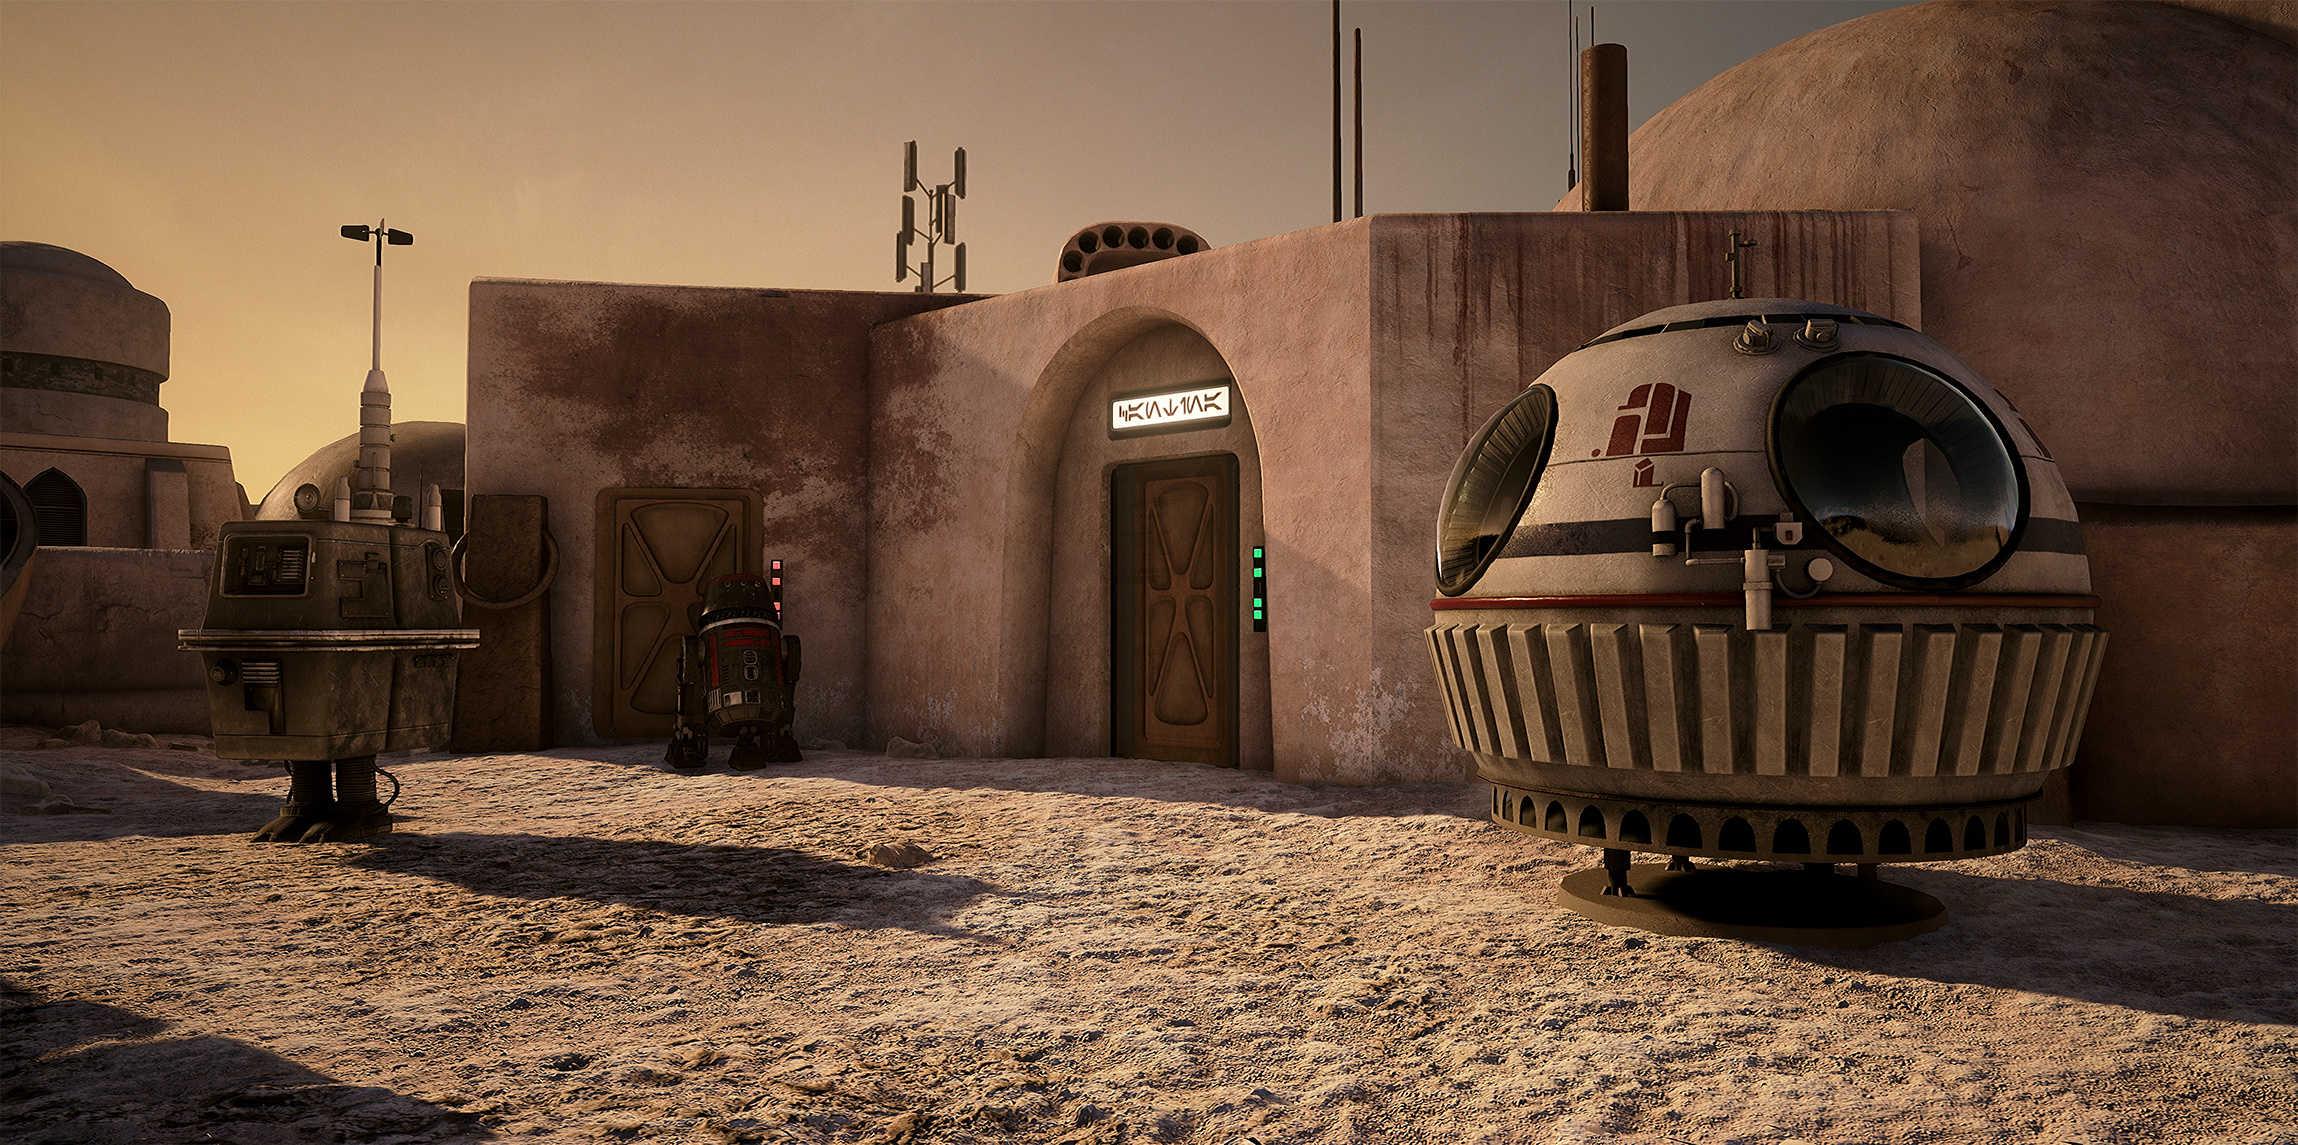 Mos-Eisley-Unreal-Engine -5-